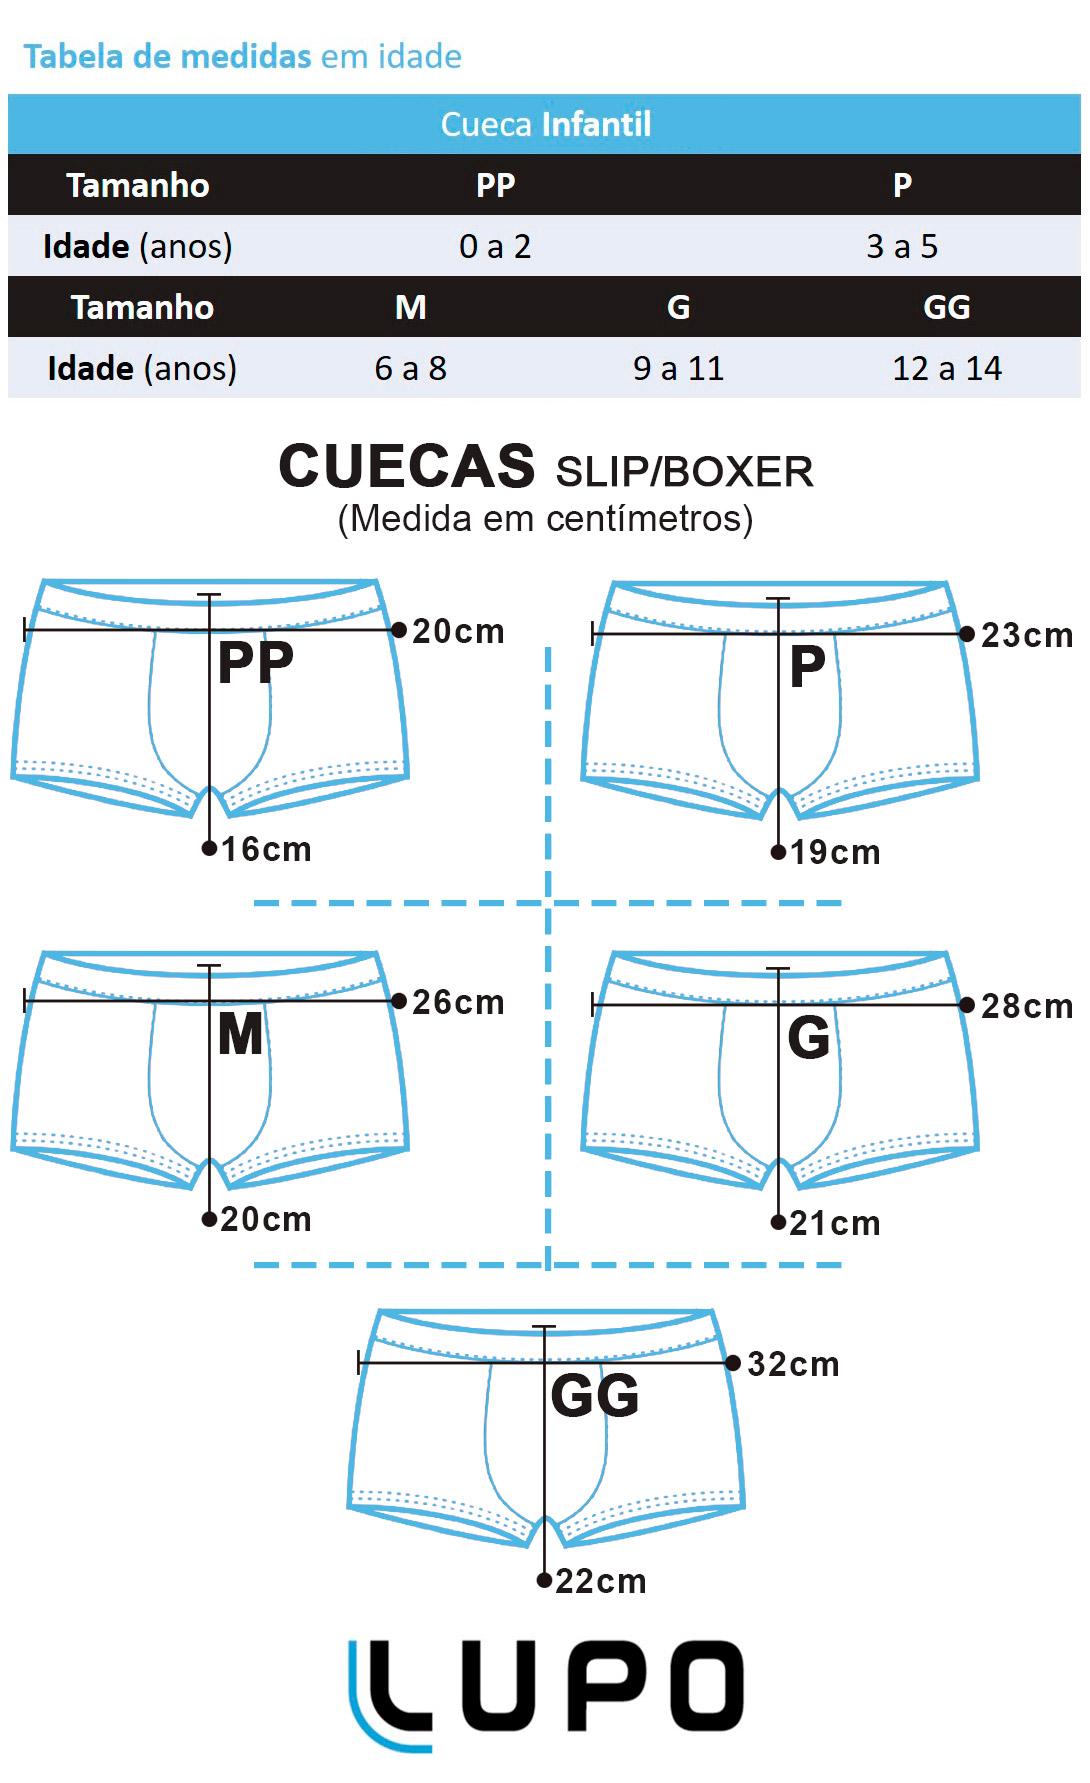 Cueca Infantil Boxer Kit 2 Preta Lupo: Tabela de medidas